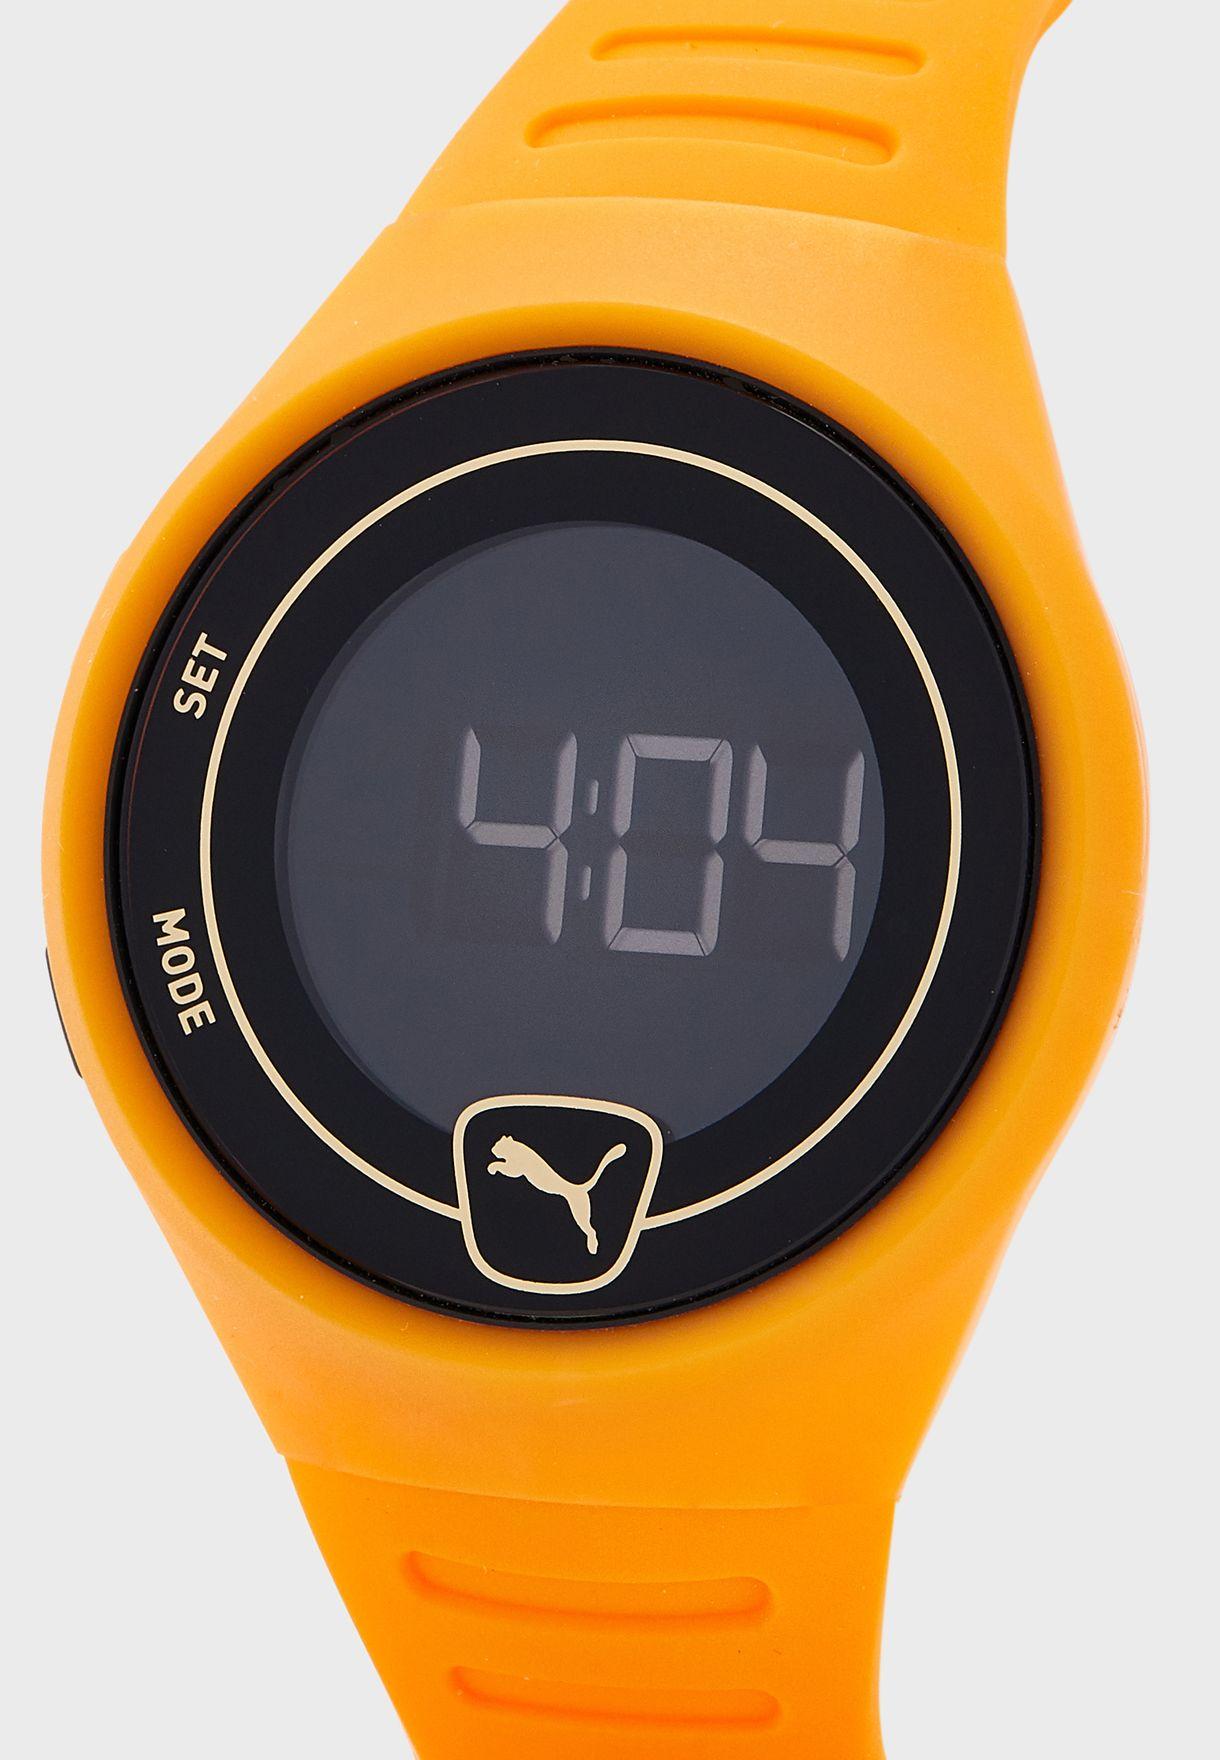 P5045 Digital Watch